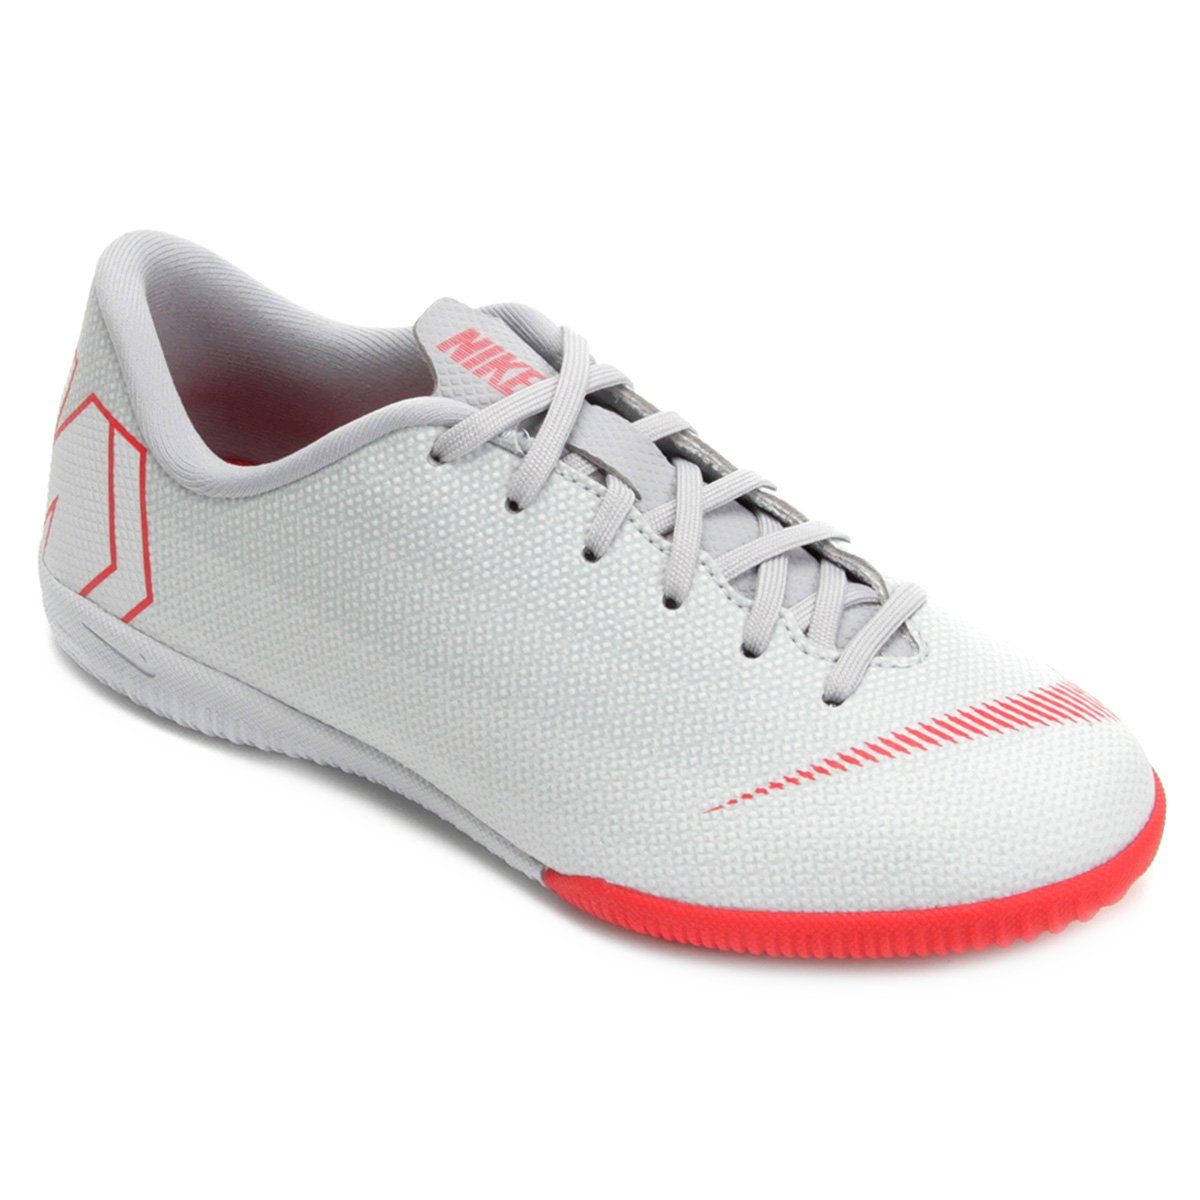 Chuteira Futsal Infantil Nike Mercurial Vapor 12 Academy GS IC - Cinza 5ebeaa077694e